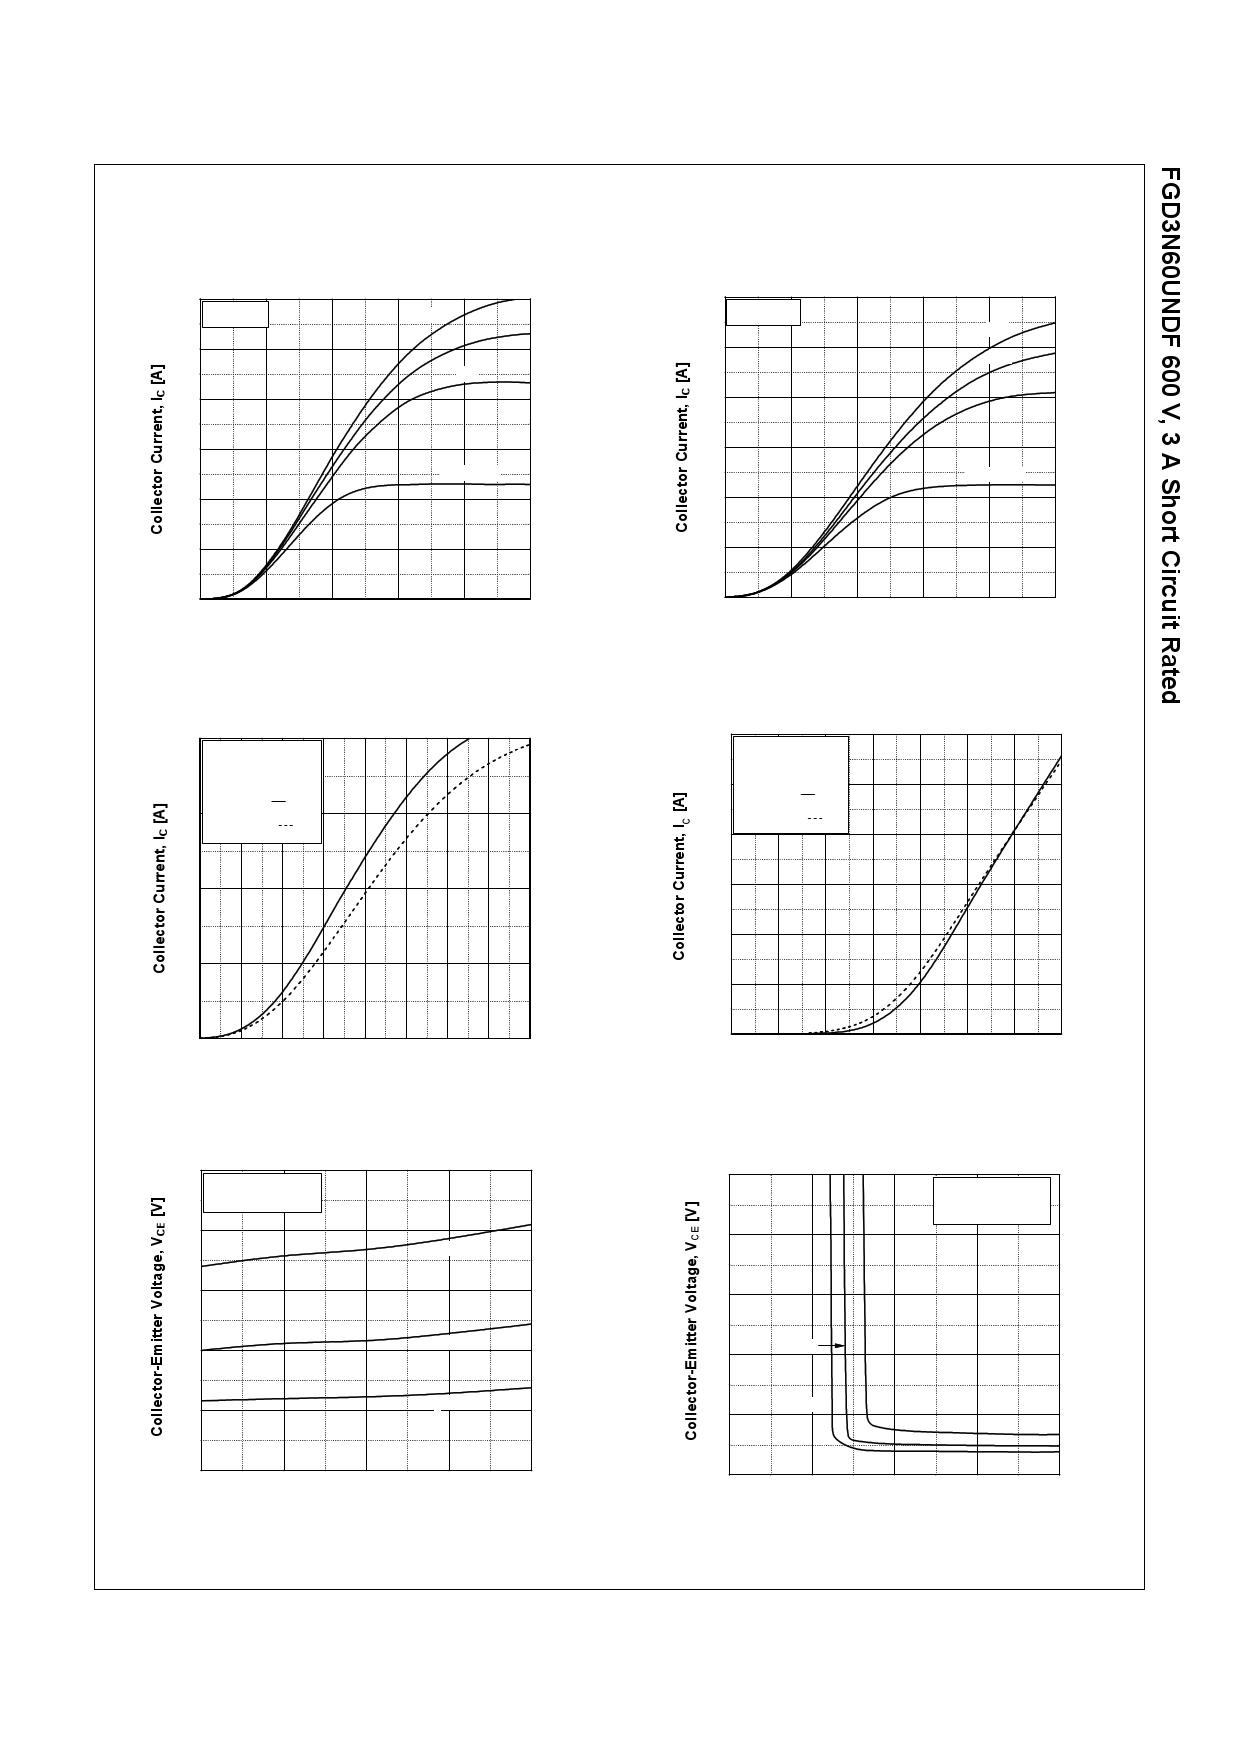 FGD3N60UNDF pdf, 반도체, 판매, 대치품